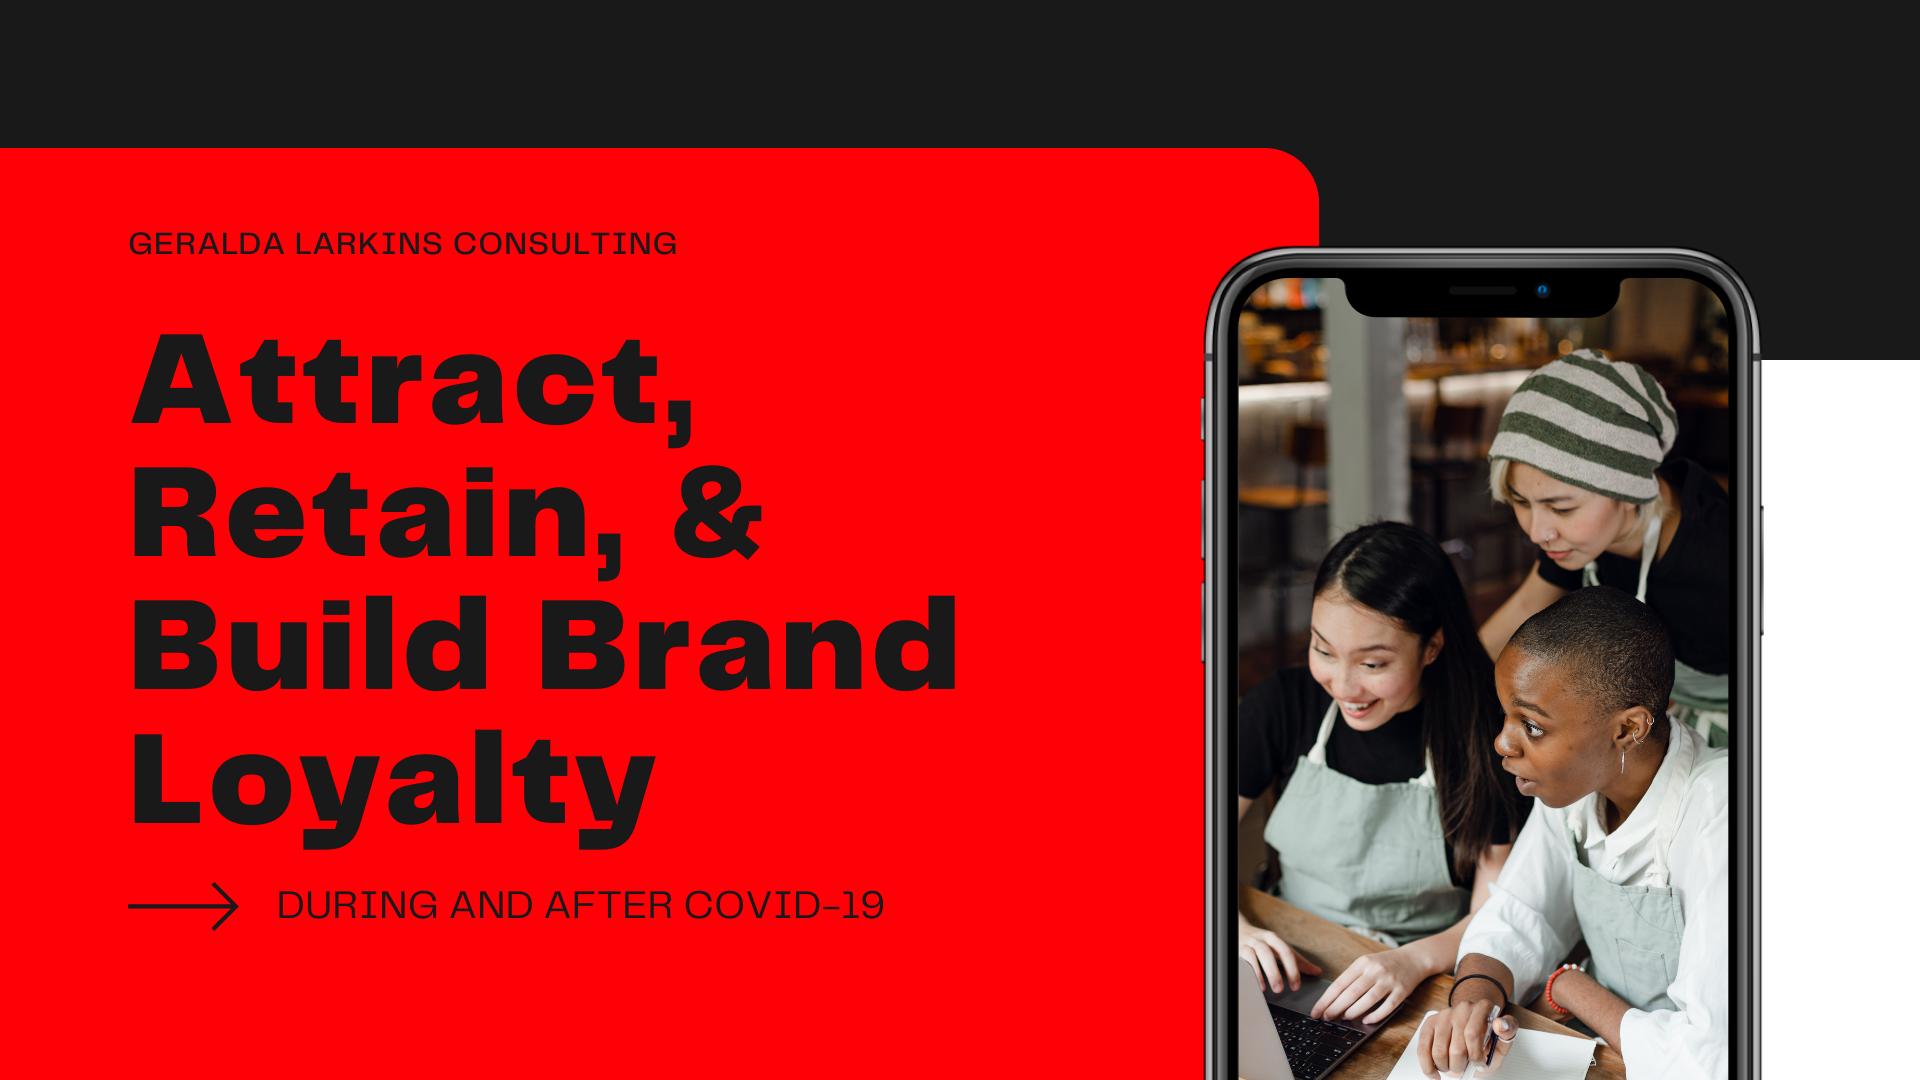 Attract, Retain, & Build Brand Loyalty